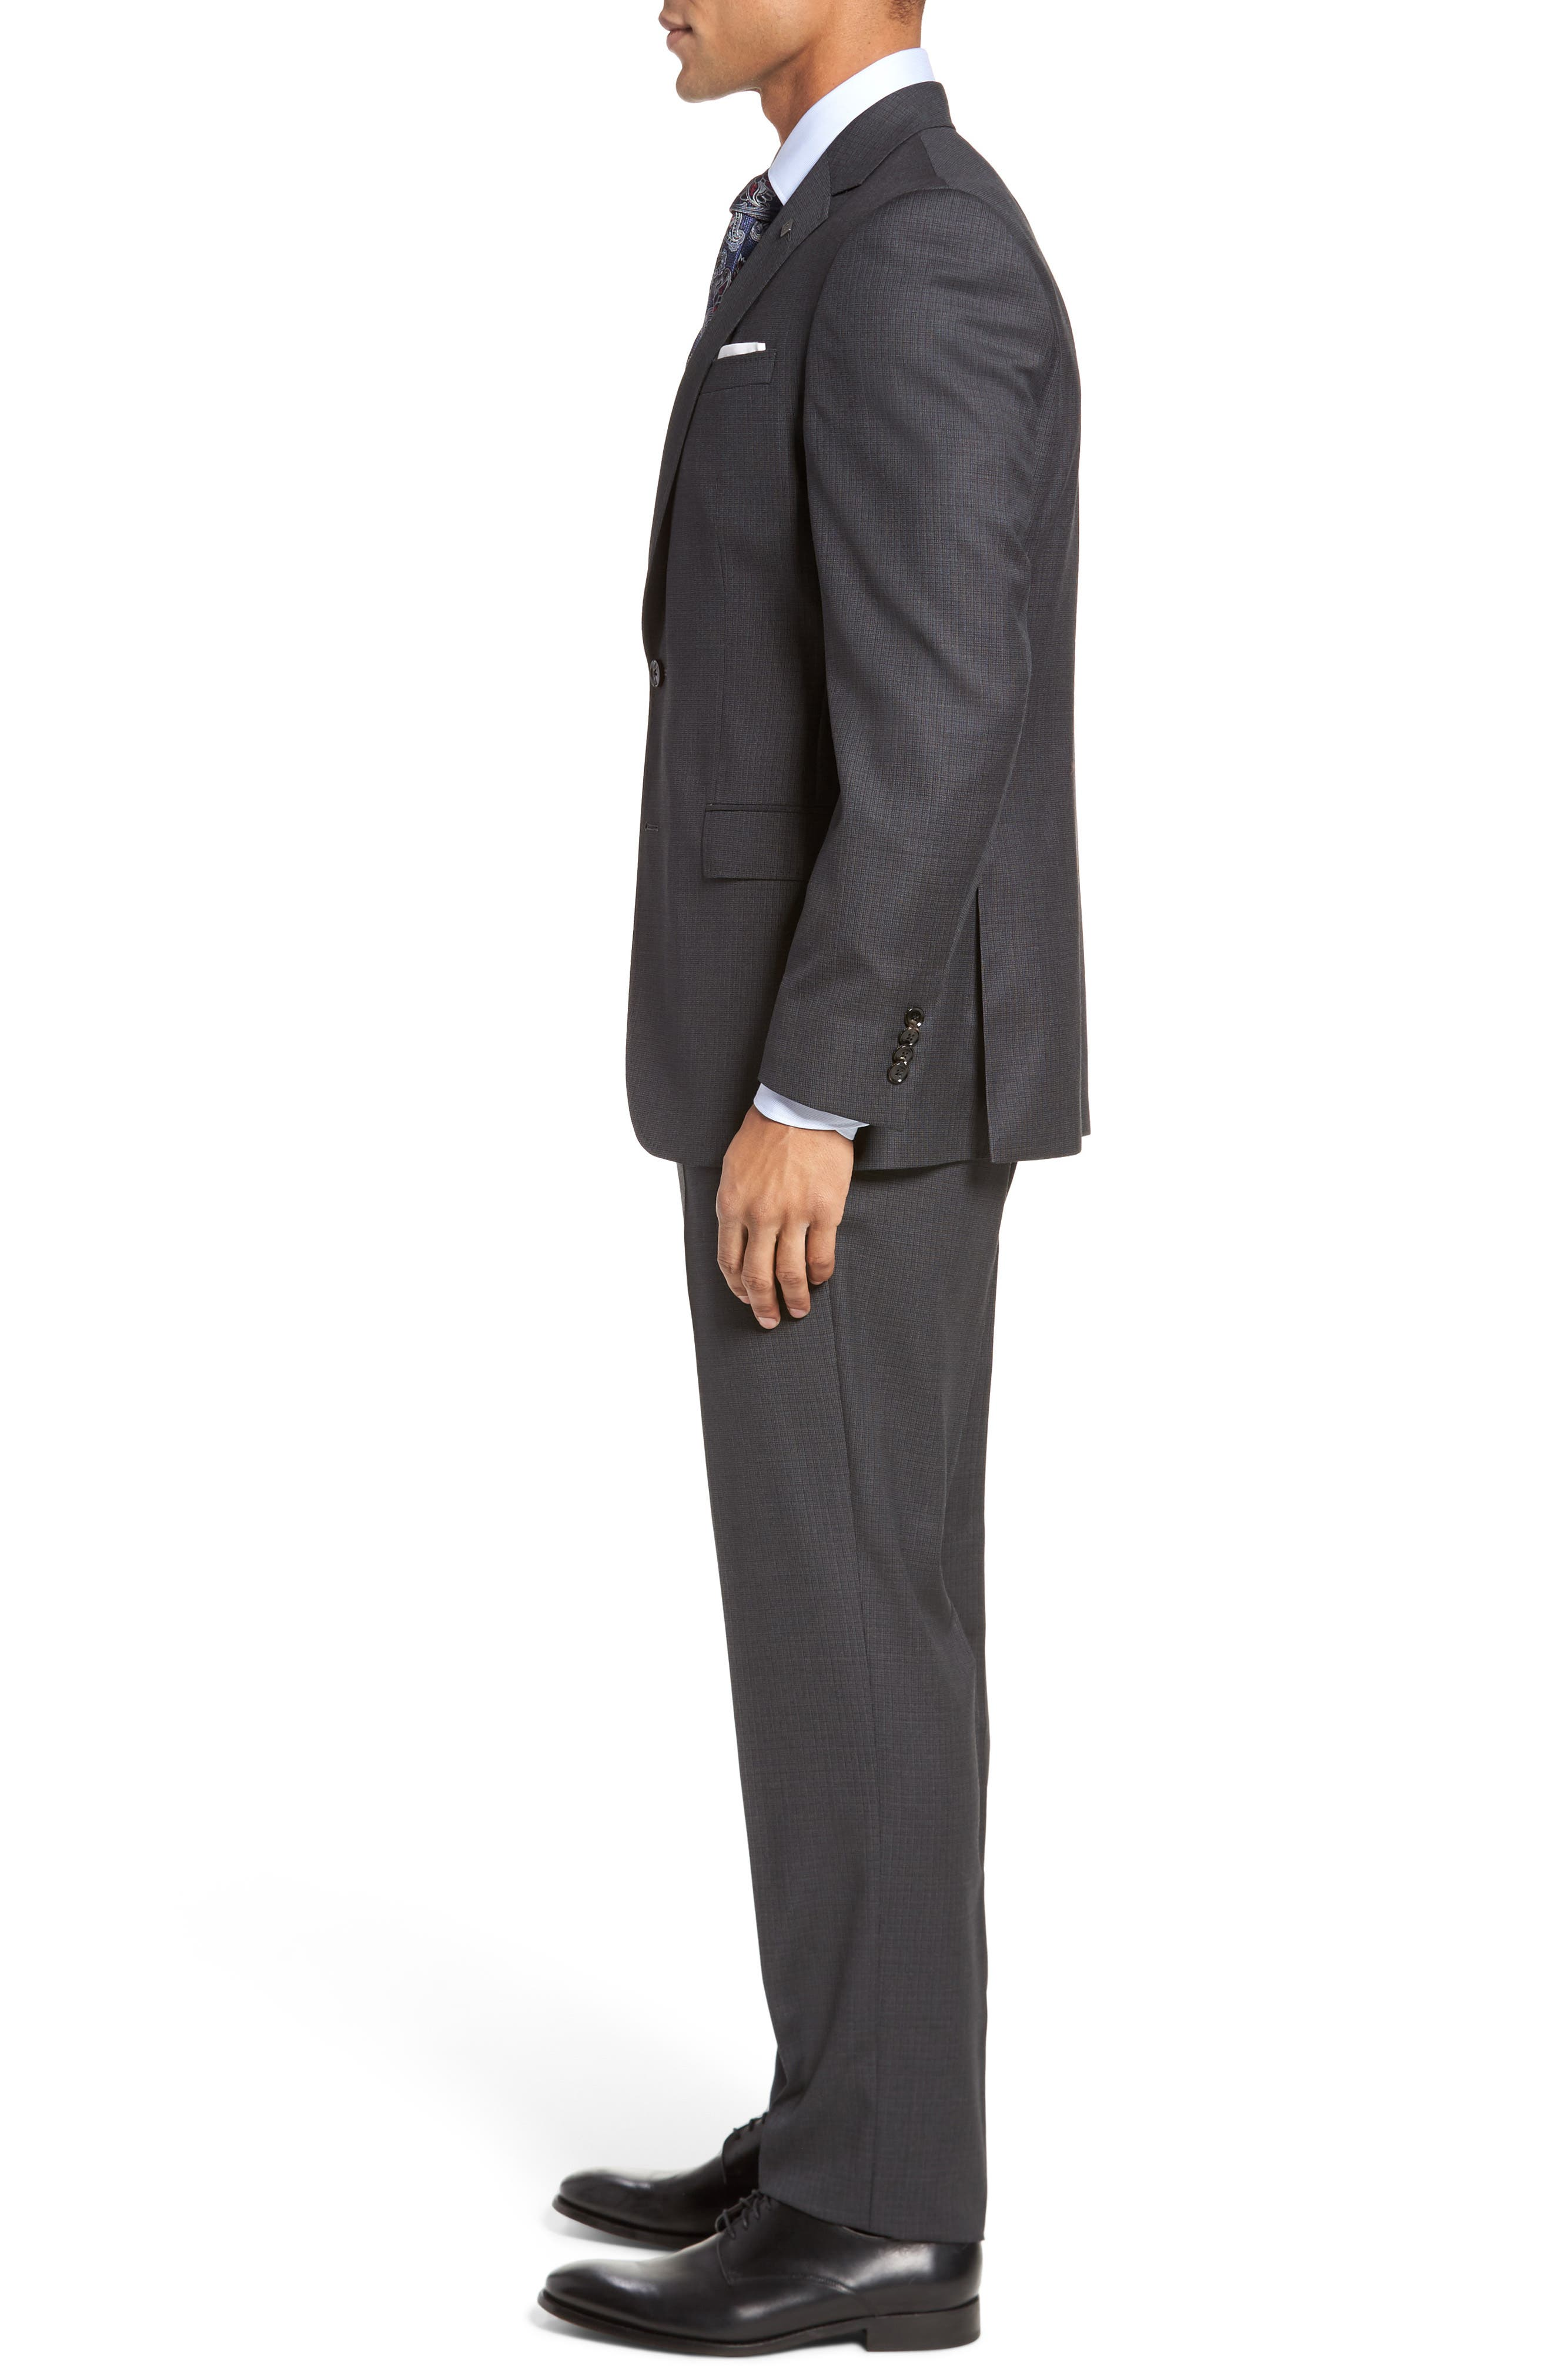 Jay Trim Fit Check Wool Suit,                             Alternate thumbnail 3, color,                             020